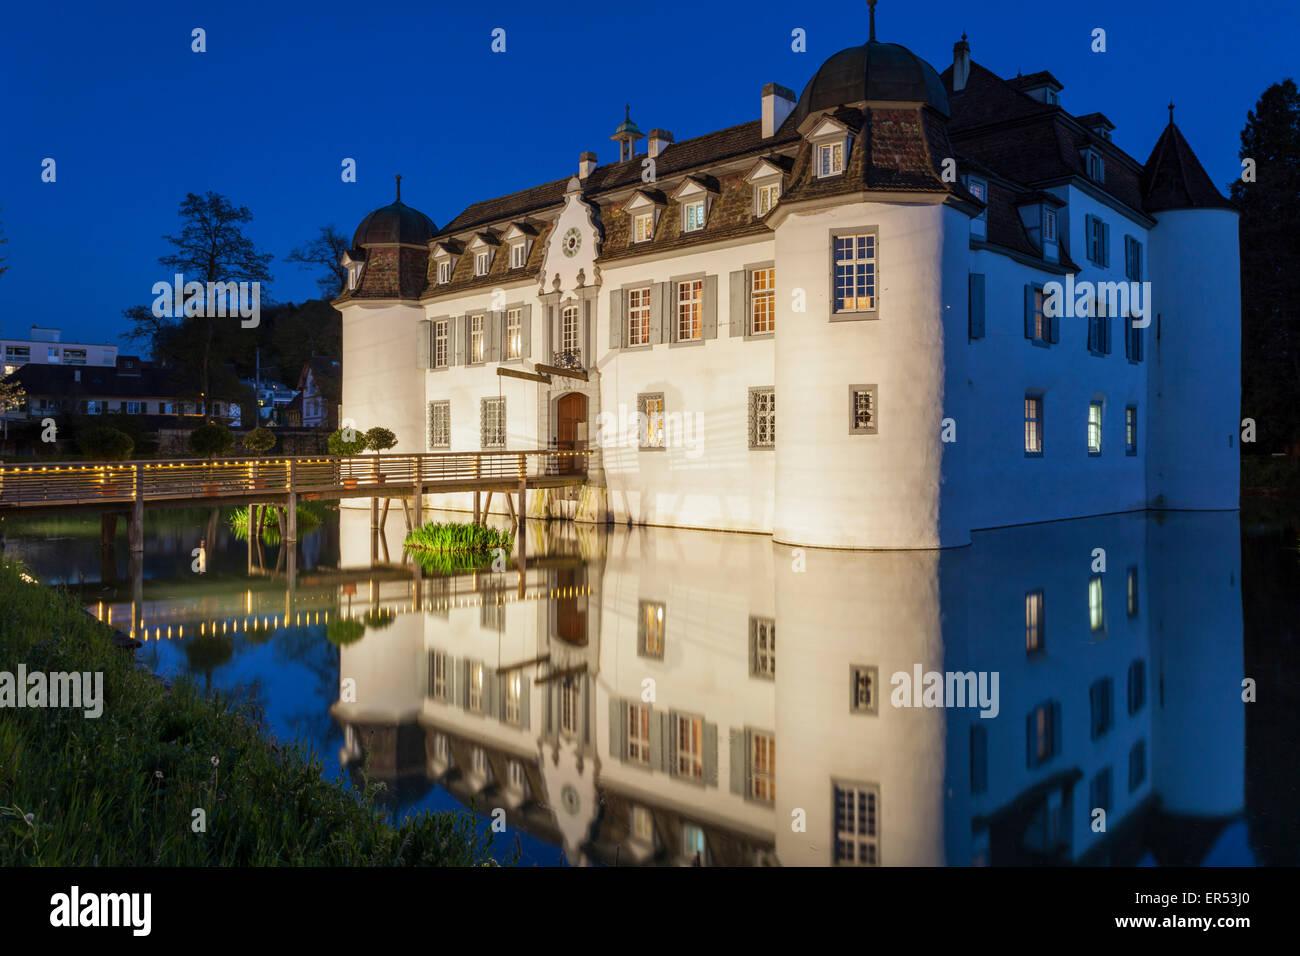 Canton Basel Land Stock Photos Canton Basel Land Stock Images Alamy